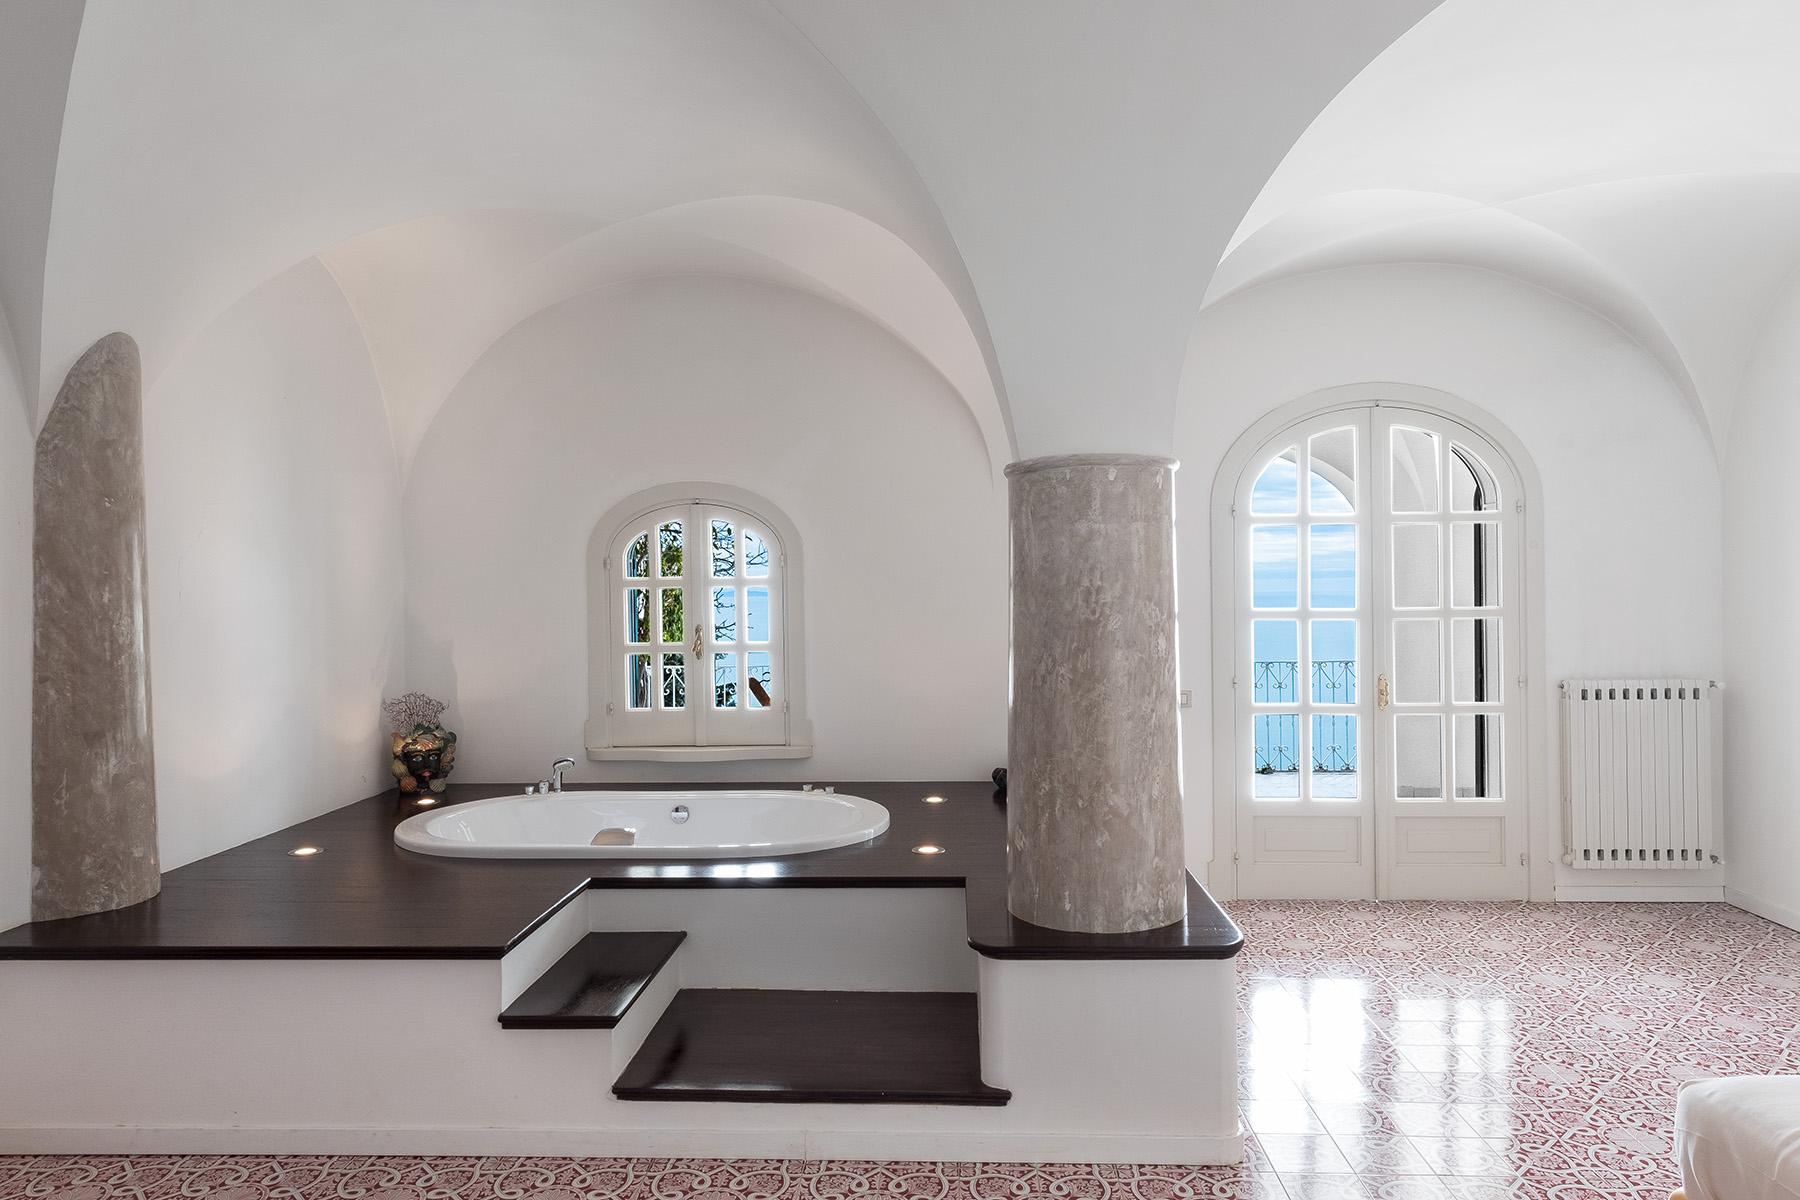 Casa indipendente in Vendita a Praiano: 4 locali, 250 mq - Foto 14